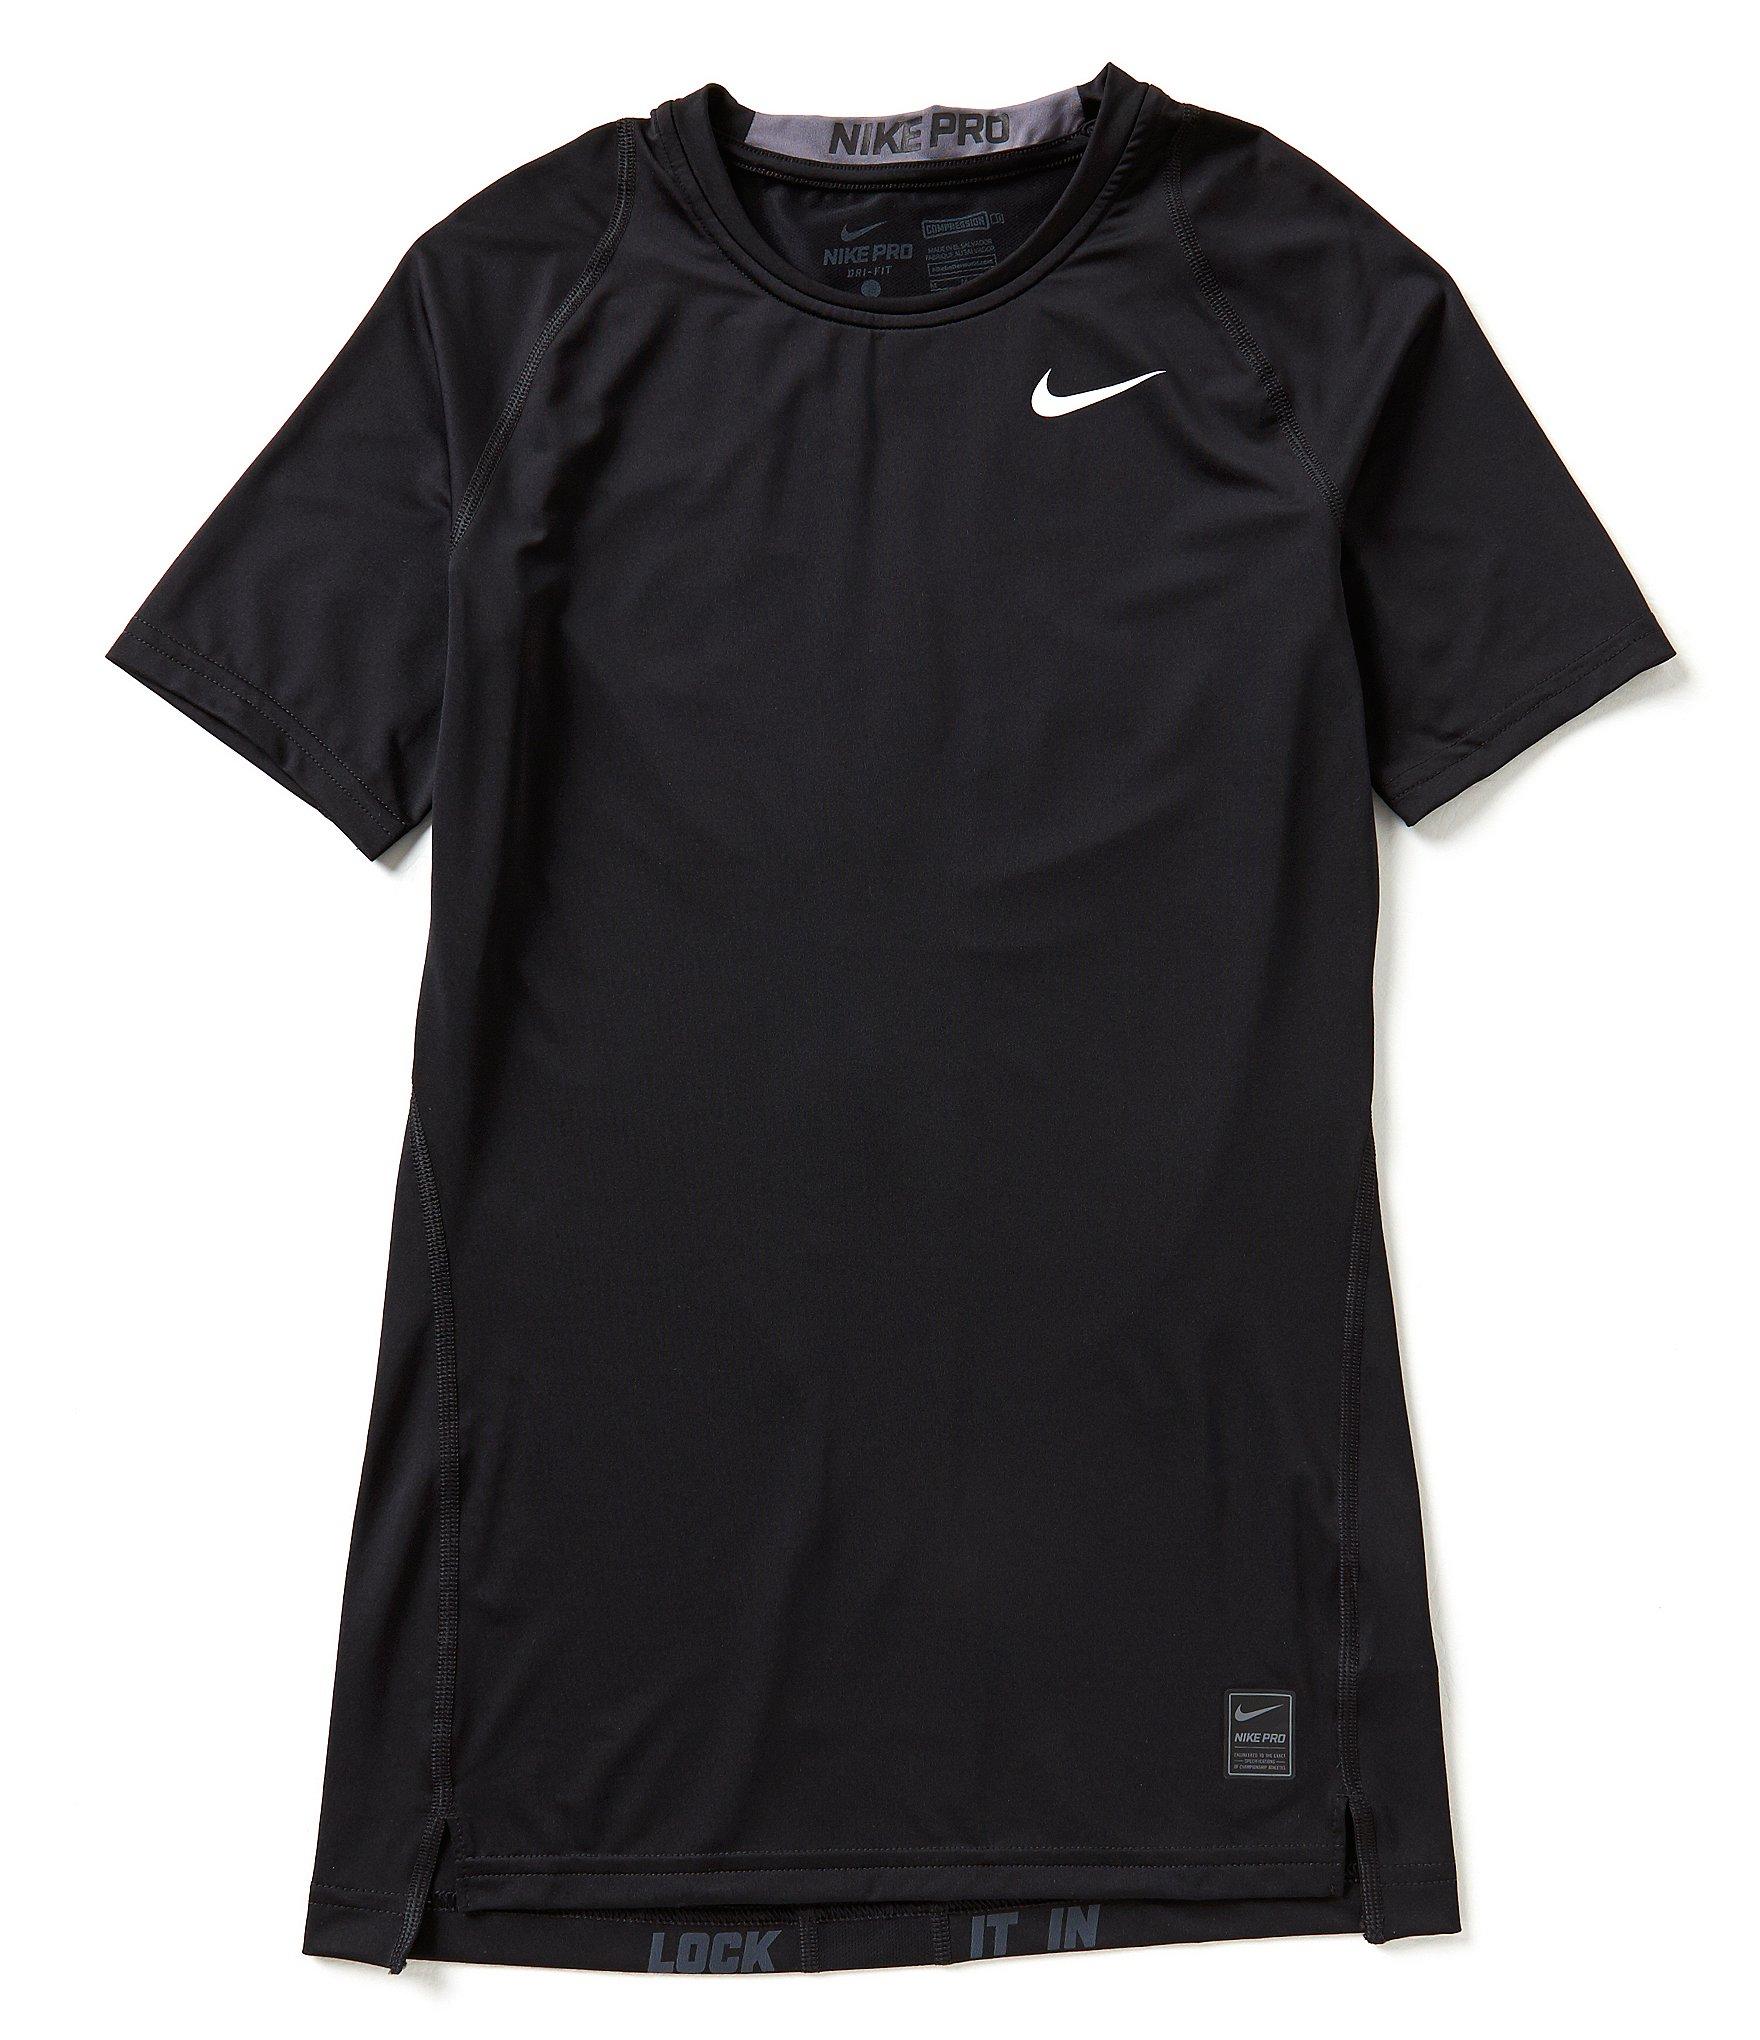 Nike hypercool compression short sleeve men s training t for Nike short sleeve shirt